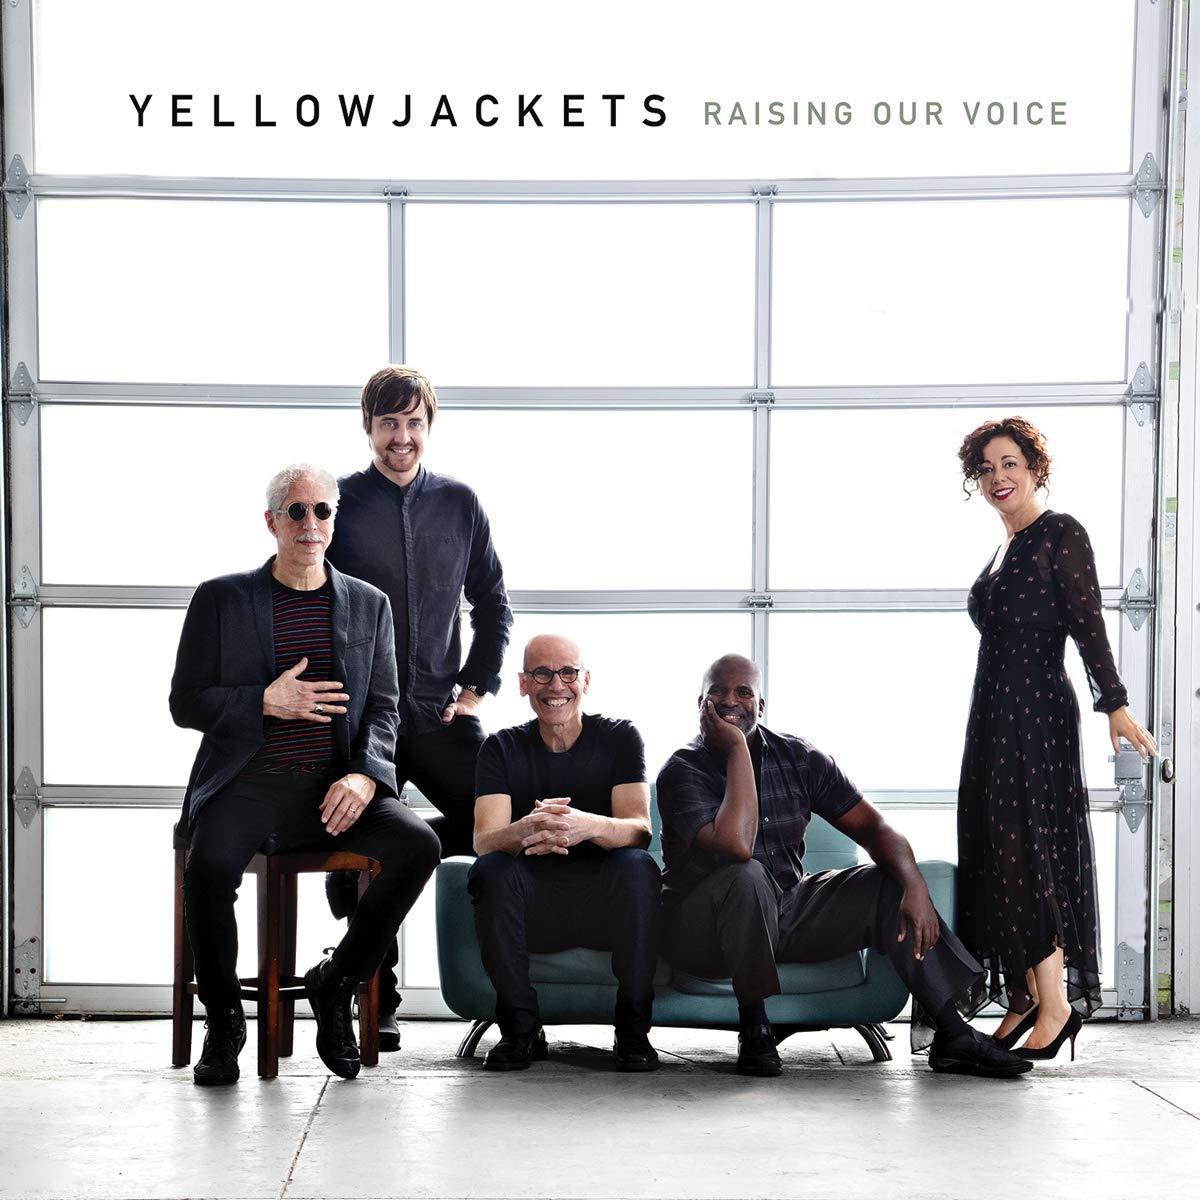 Yellowjackets publican Raising Our Voices